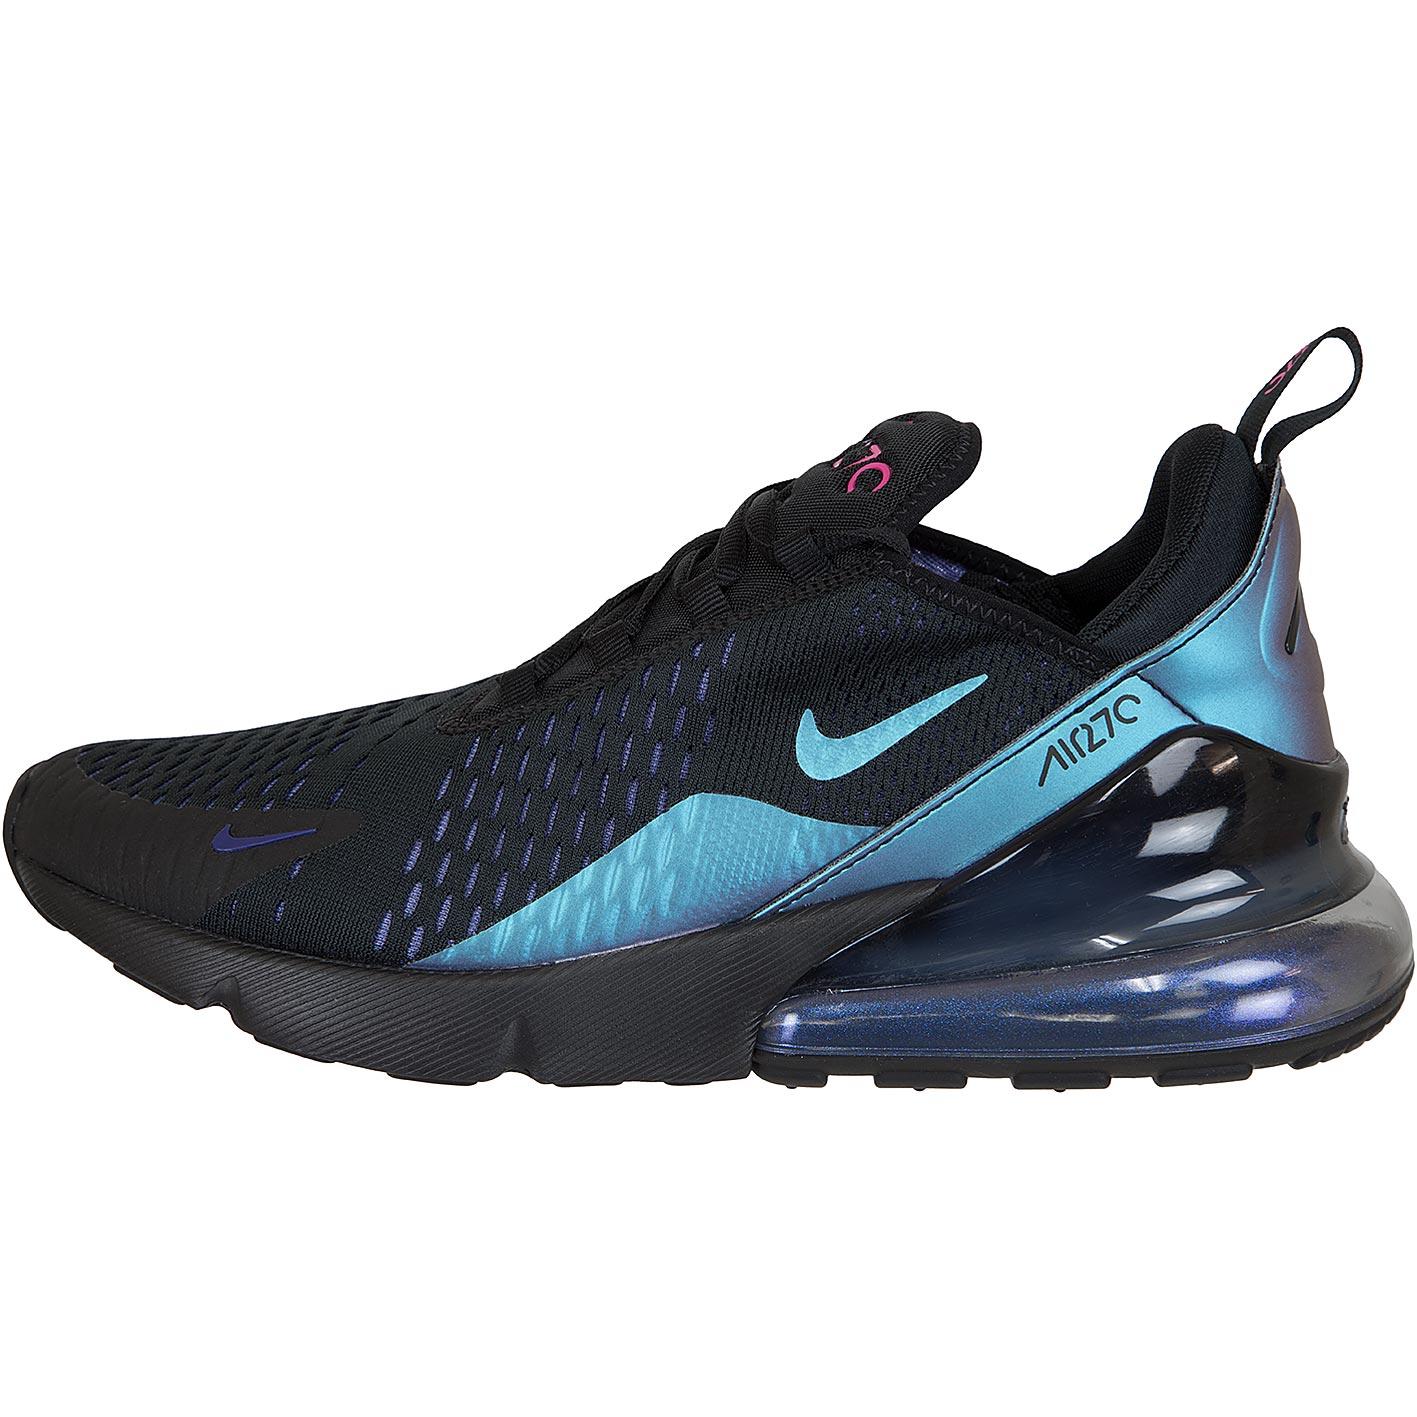 ☆ Nike Damen Sneaker Air Max 270 schwarzlilatürkis hier